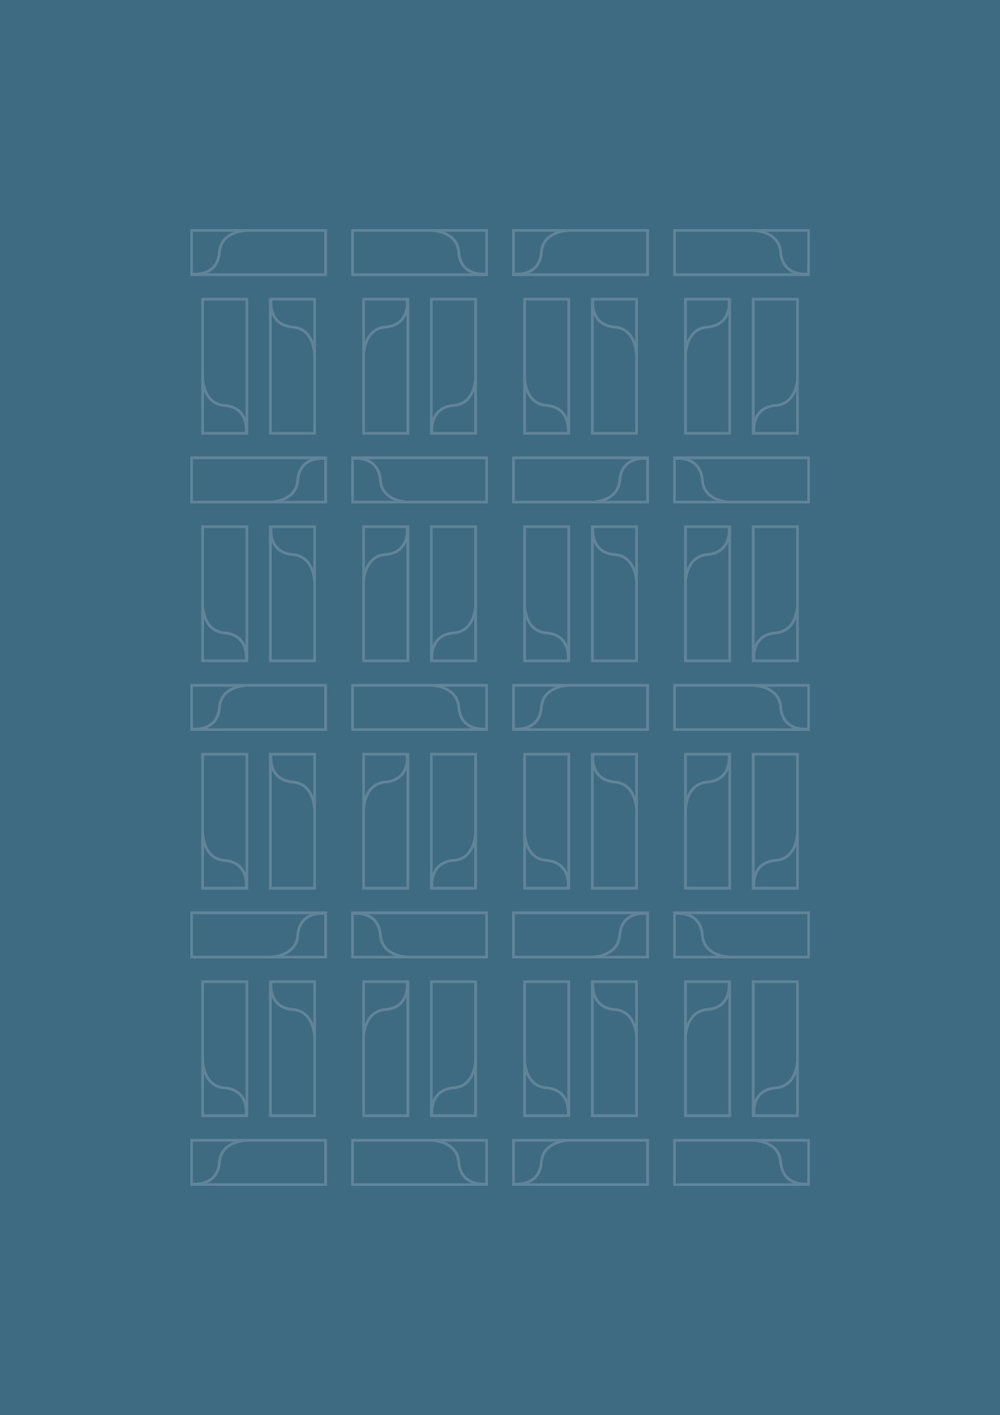 Block 275_Logo Concept 1 - 4.jpg